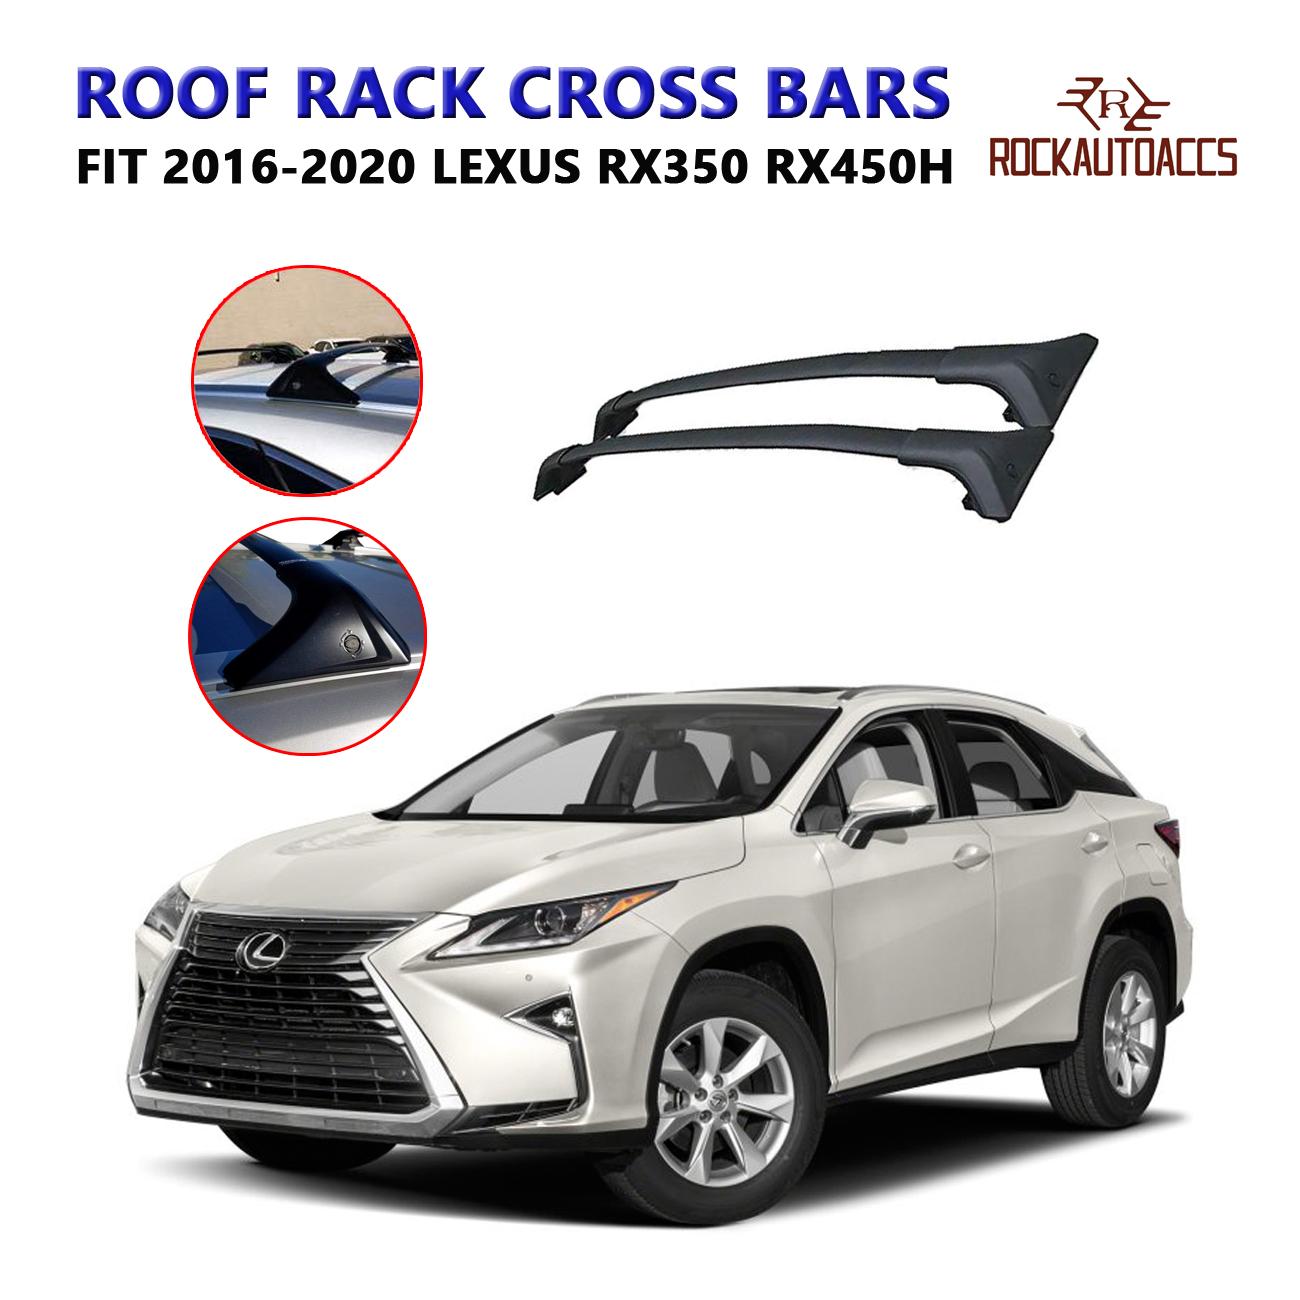 HEKA Cross Bar for Lexus UX 2019 2020 2021 Crossbar Roof Rail Rack Luggage